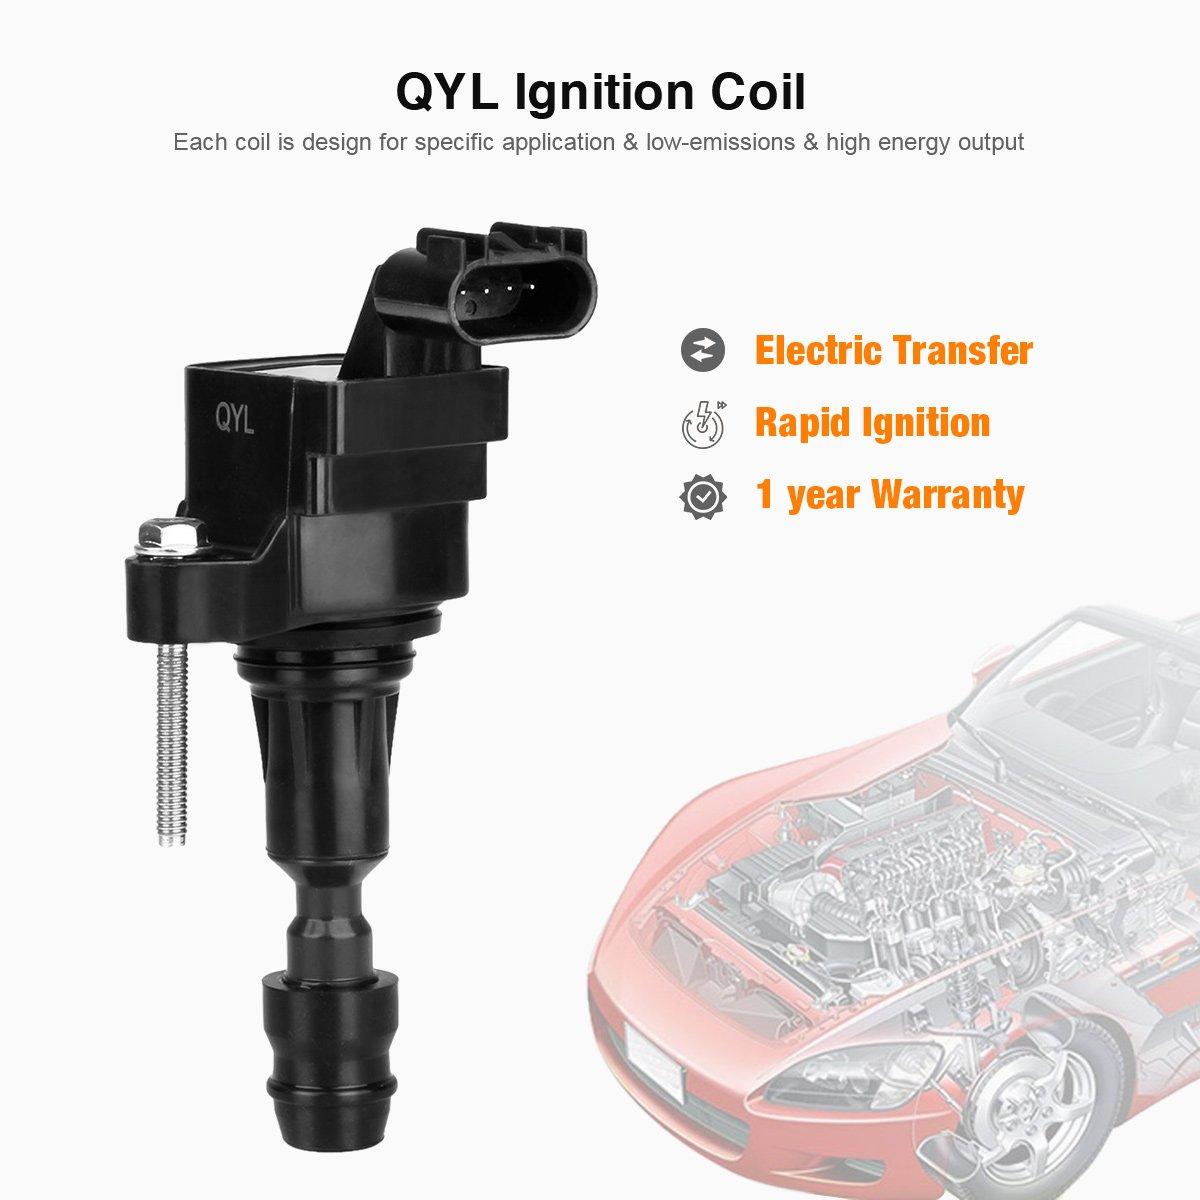 QYL Pack de 4 bobina de encendido para Chevrolet GMC Pontiac Saturn Saab cobalto Equinox Malibu HHR G5 G6 Aura Vue C1552 UF491 d522 C uf-491: Amazon.es: ...